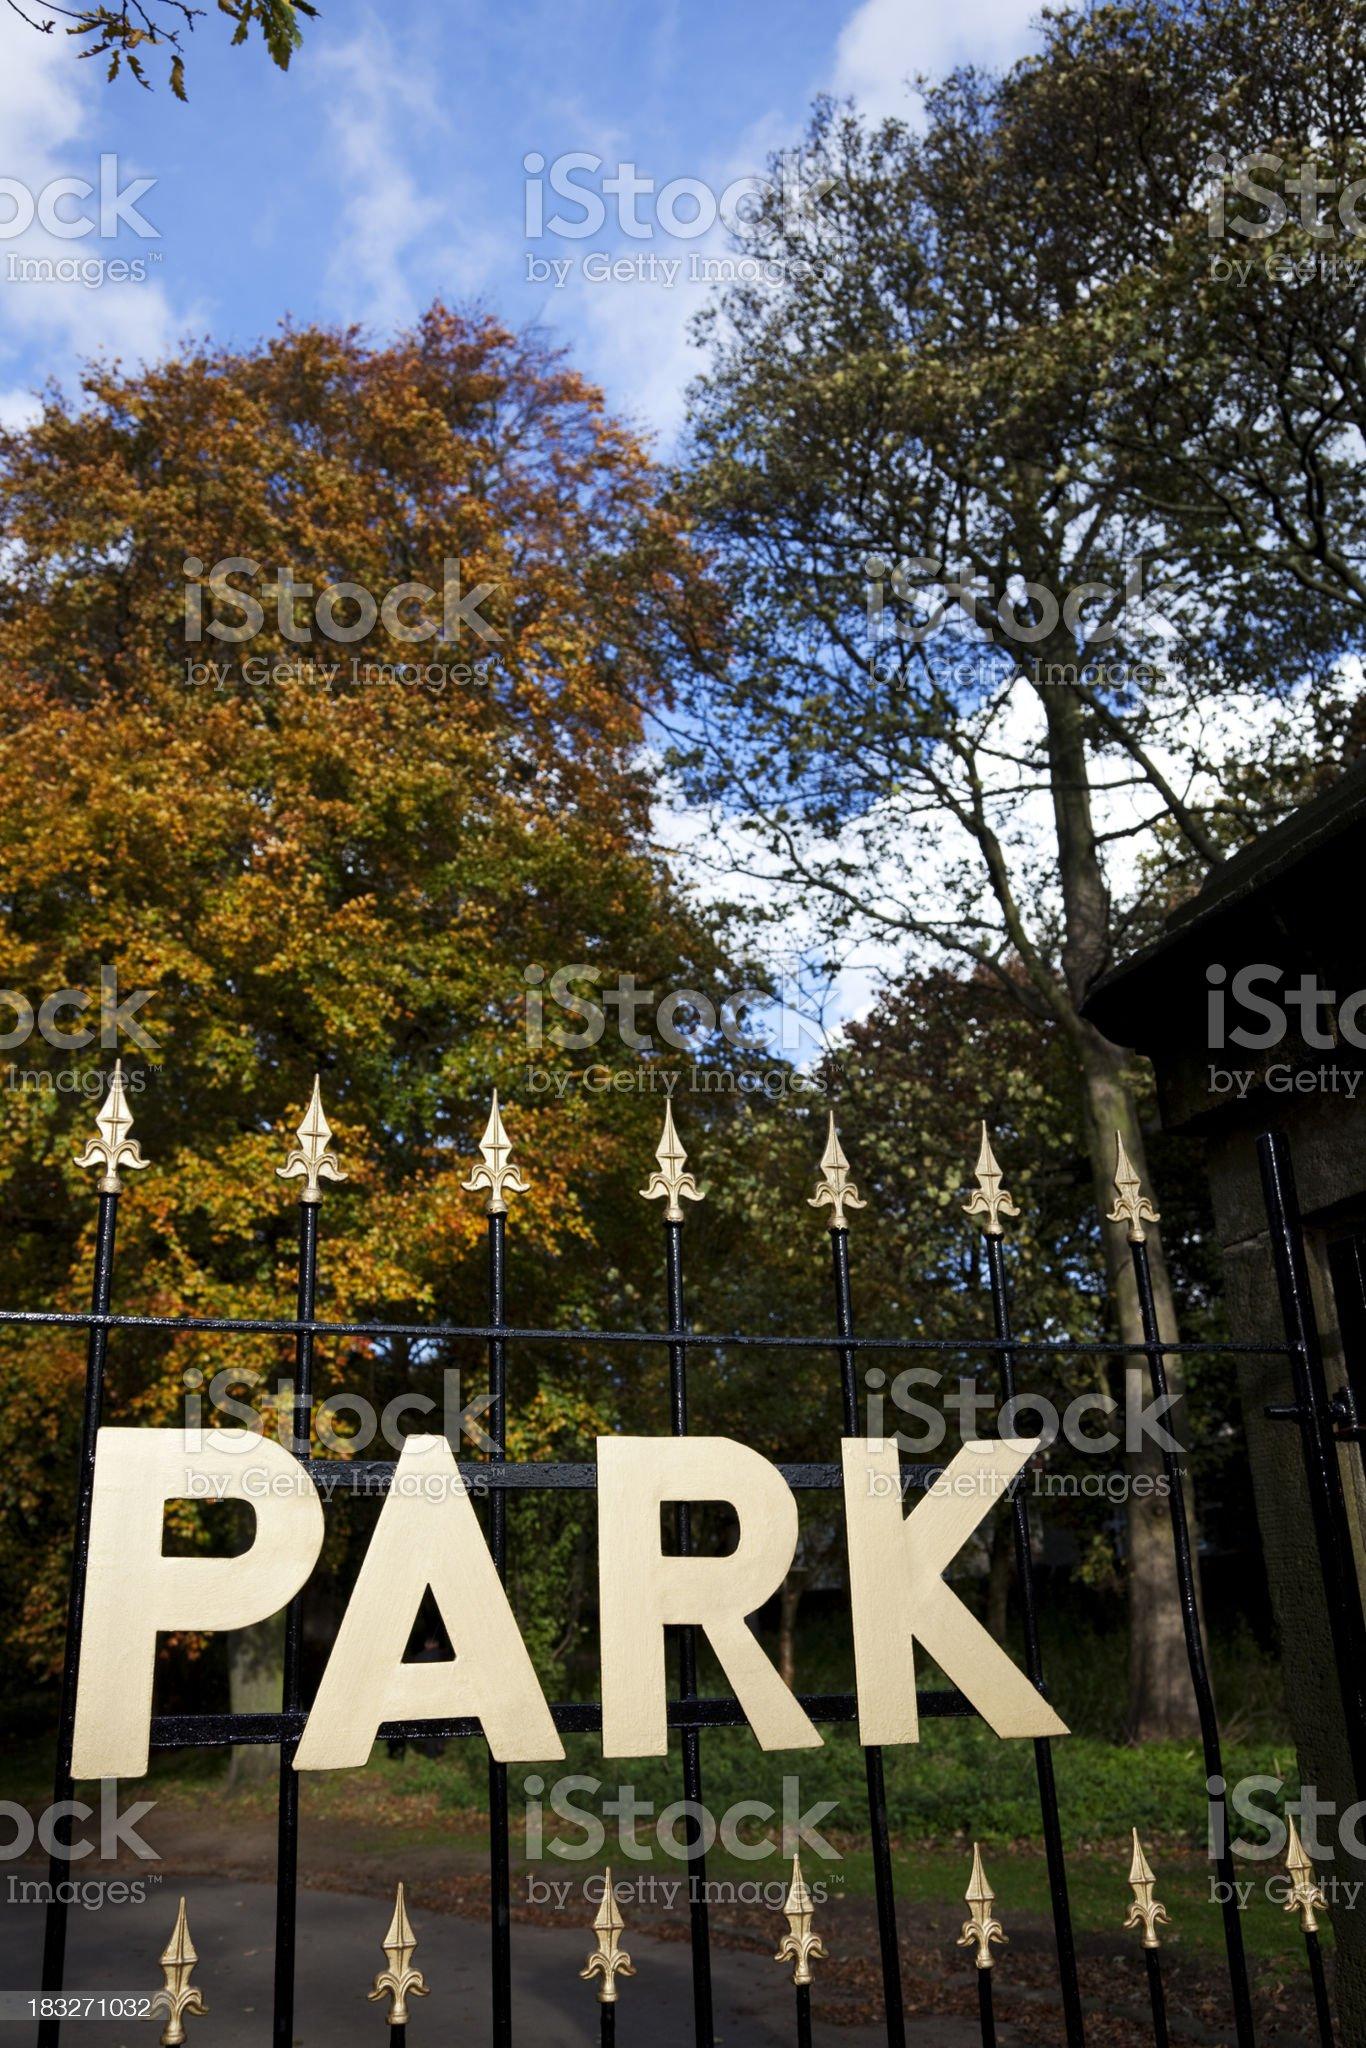 Park gate royalty-free stock photo